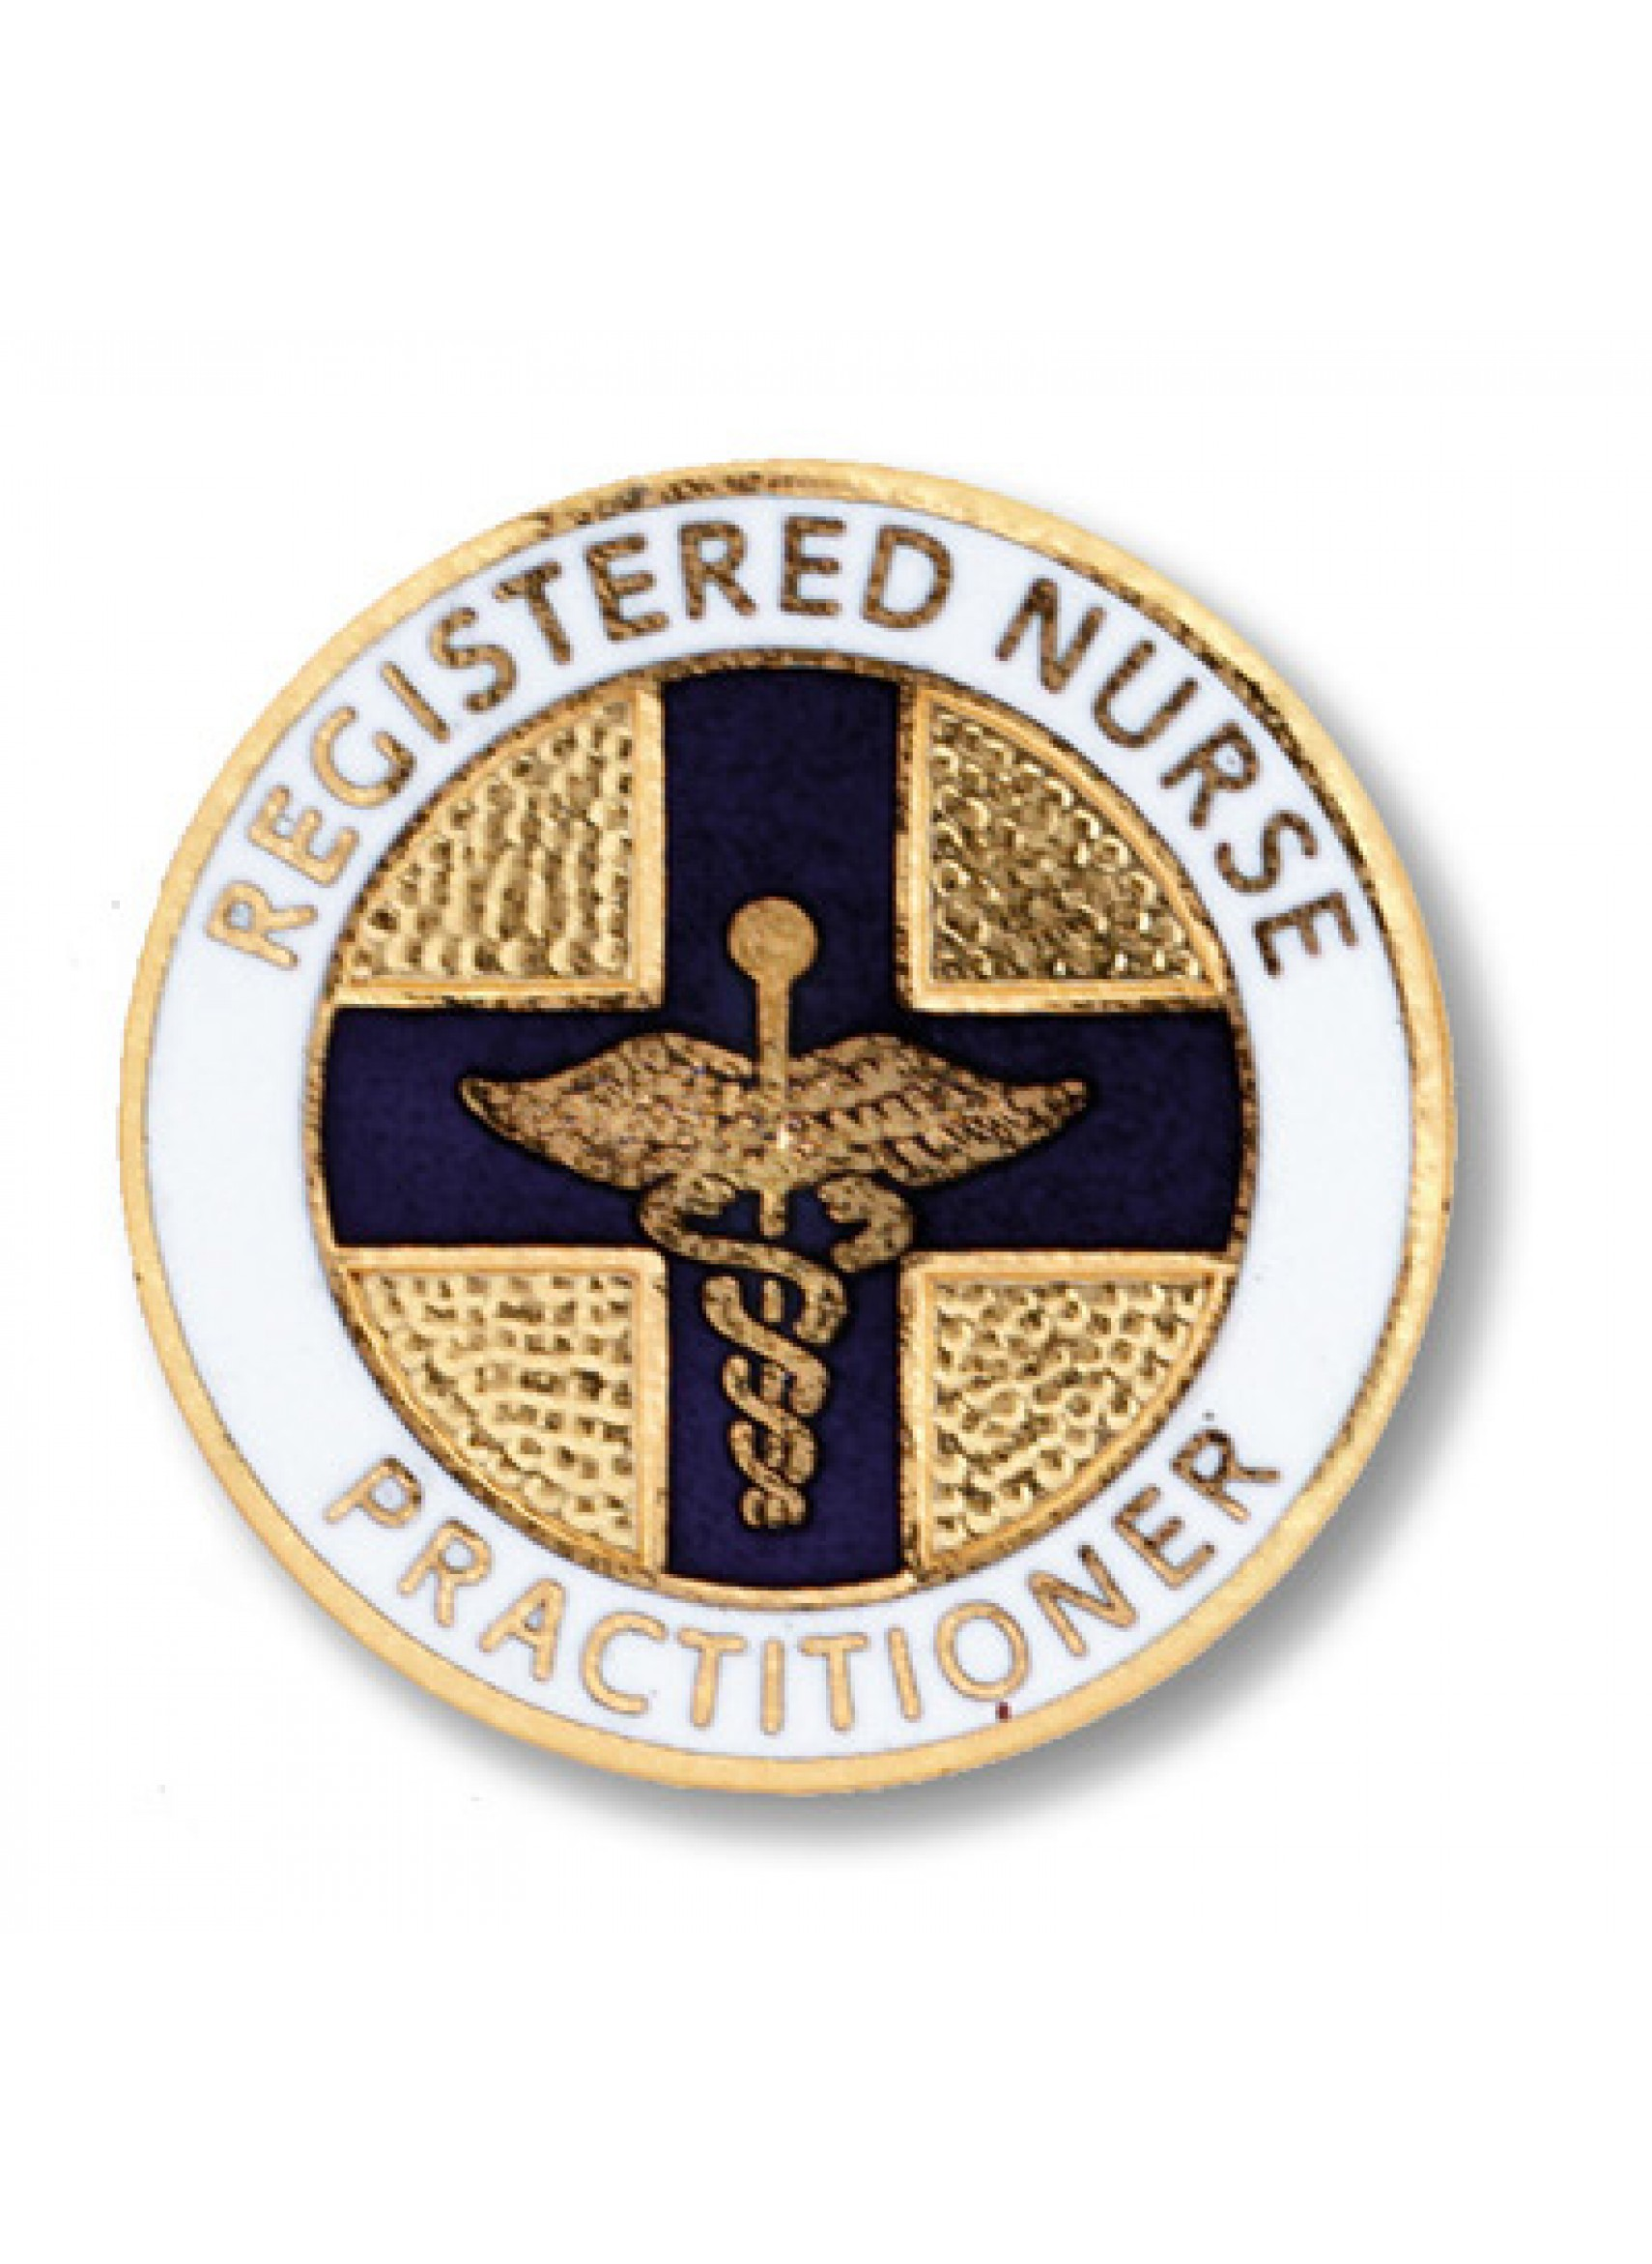 Prestige registered nurse practitioner pin 1017 murse world prestige registered nurse practitioner pin 1017 biocorpaavc